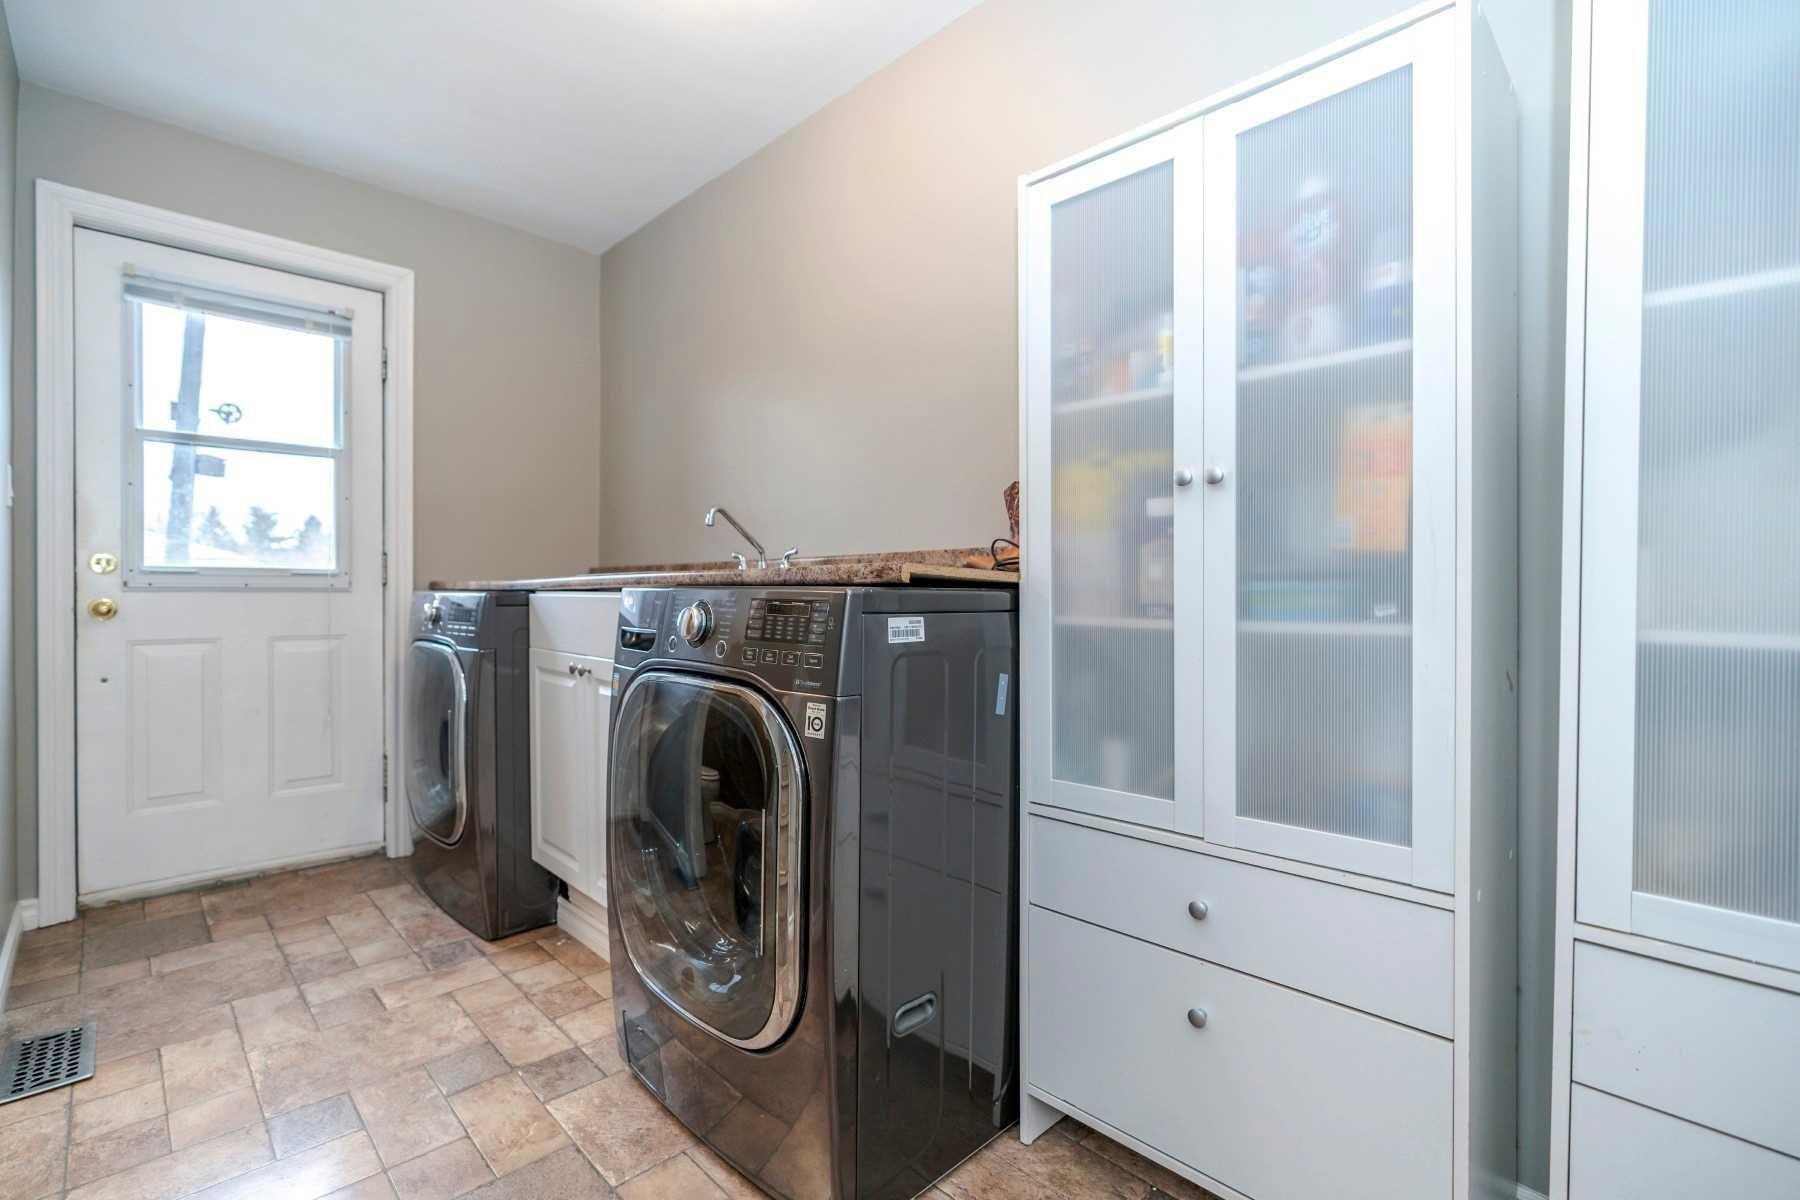 Photo 13: Photos: 190 N Church Street in Clarington: Orono House (Sidesplit 4) for sale : MLS®# E4463047